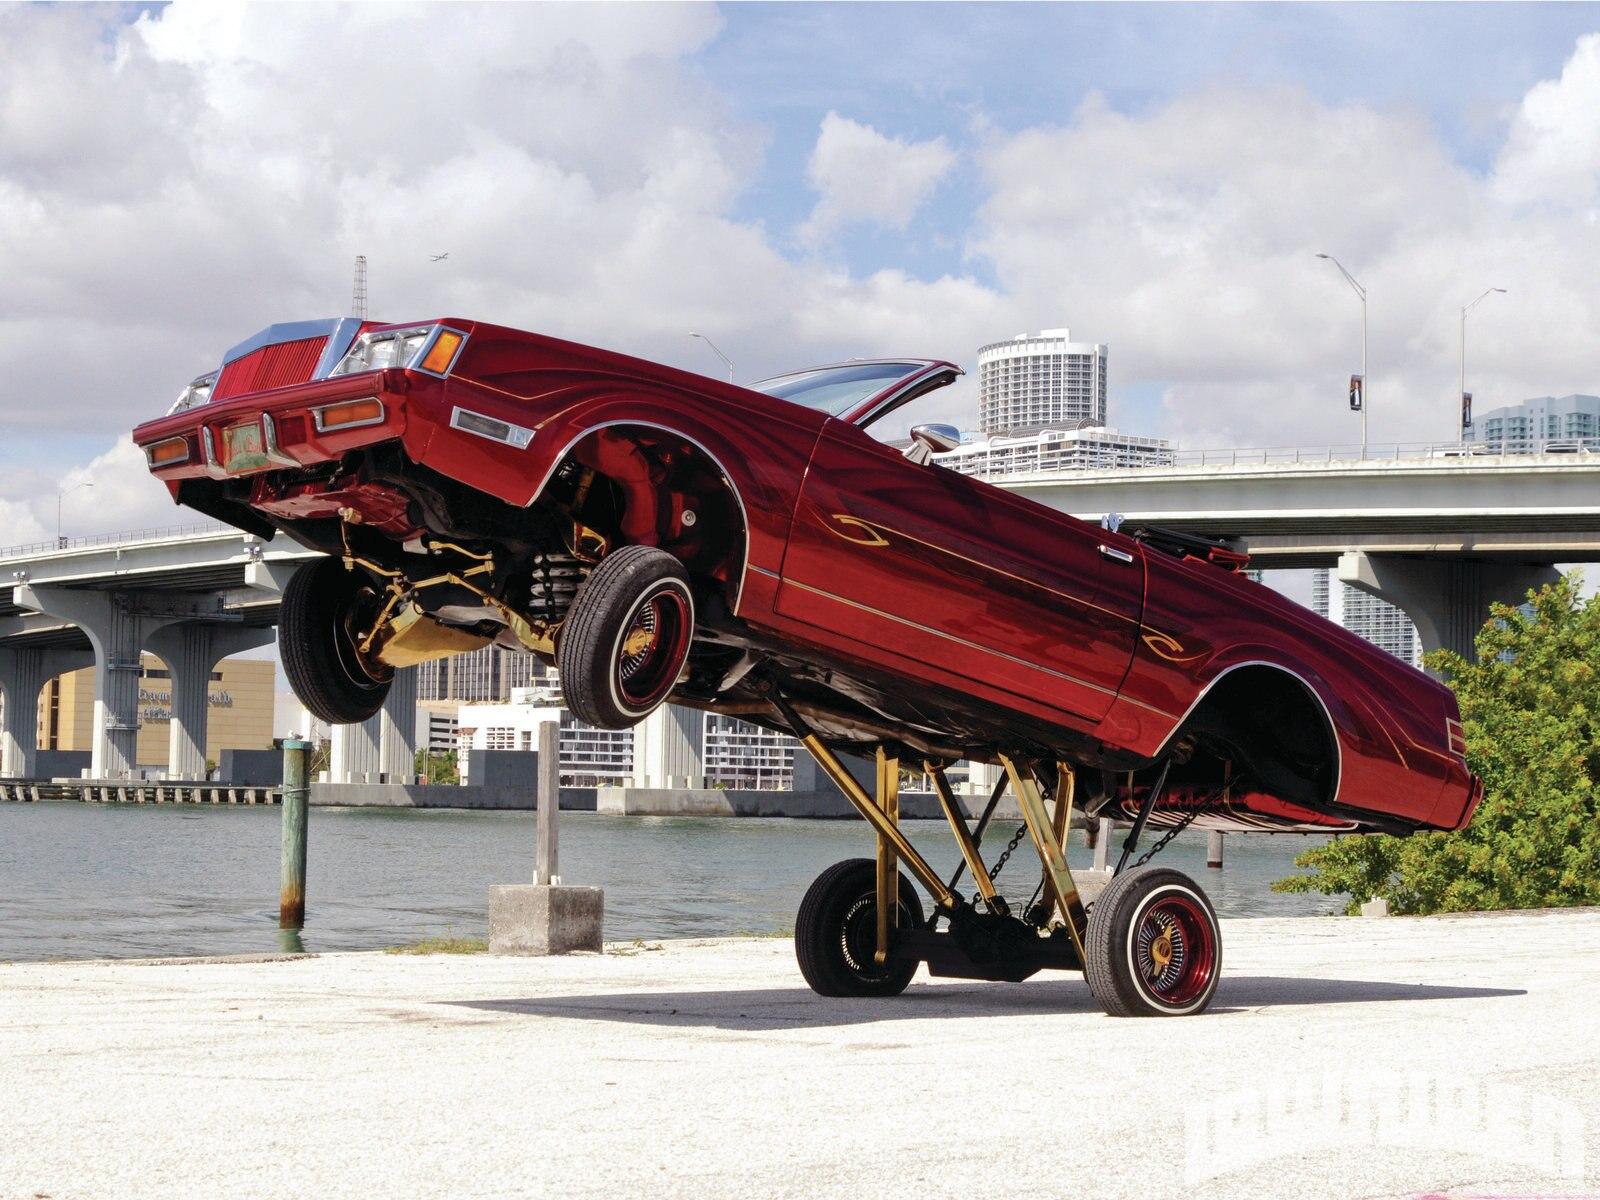 lrmp-1107-01-z-1985-buick-regal-hopping1